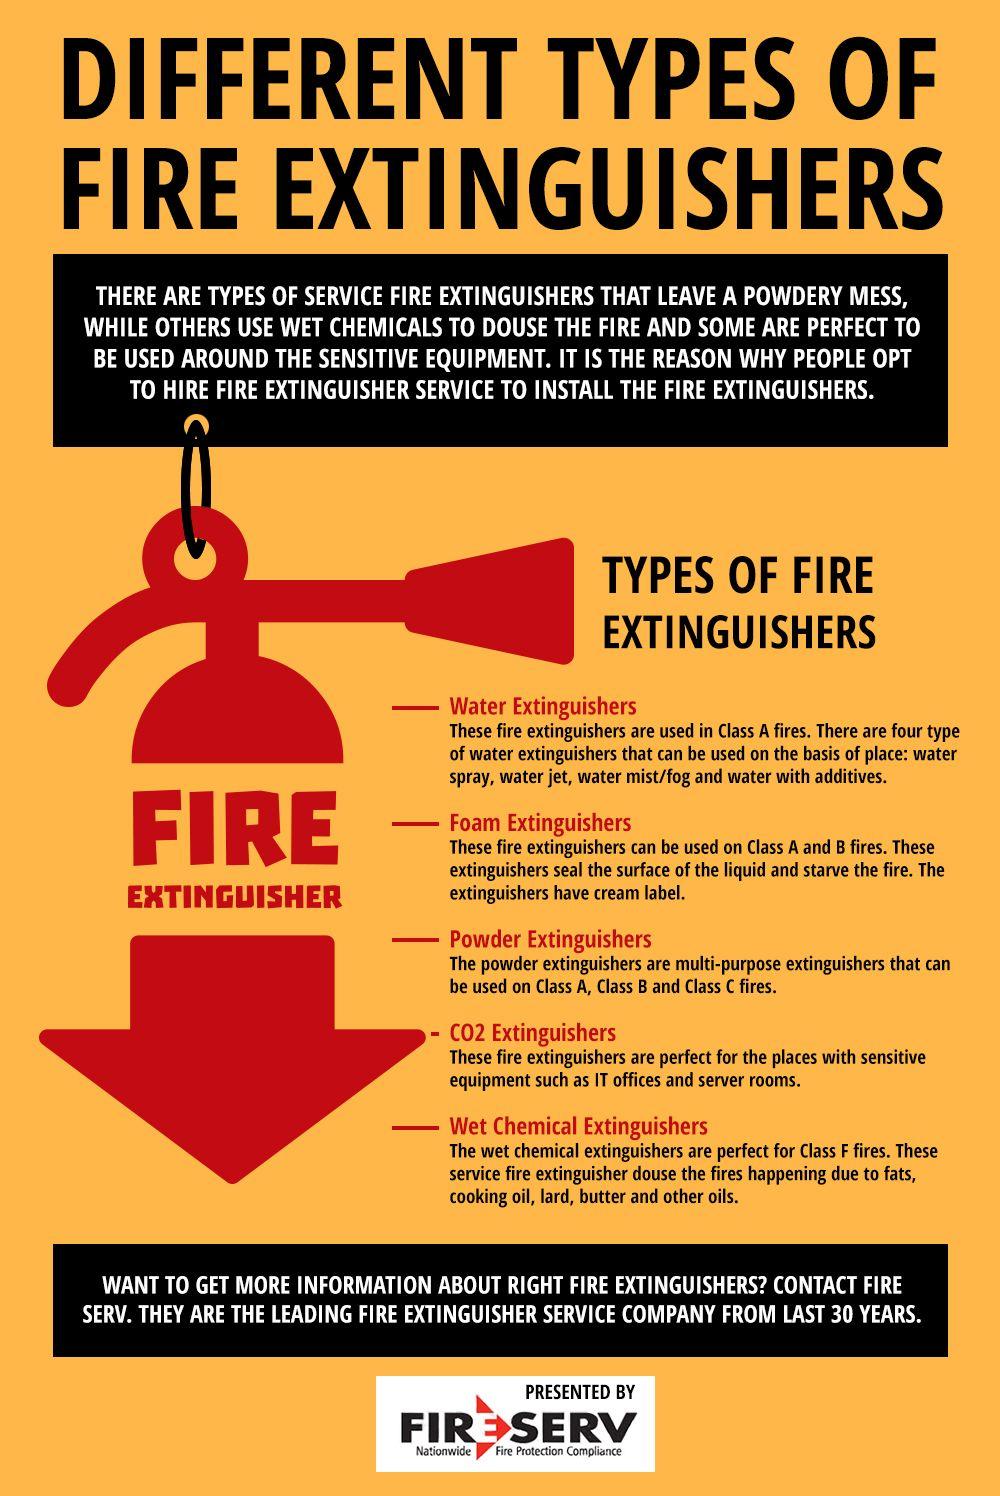 Fire Extinguisher Service Fire extinguisher service